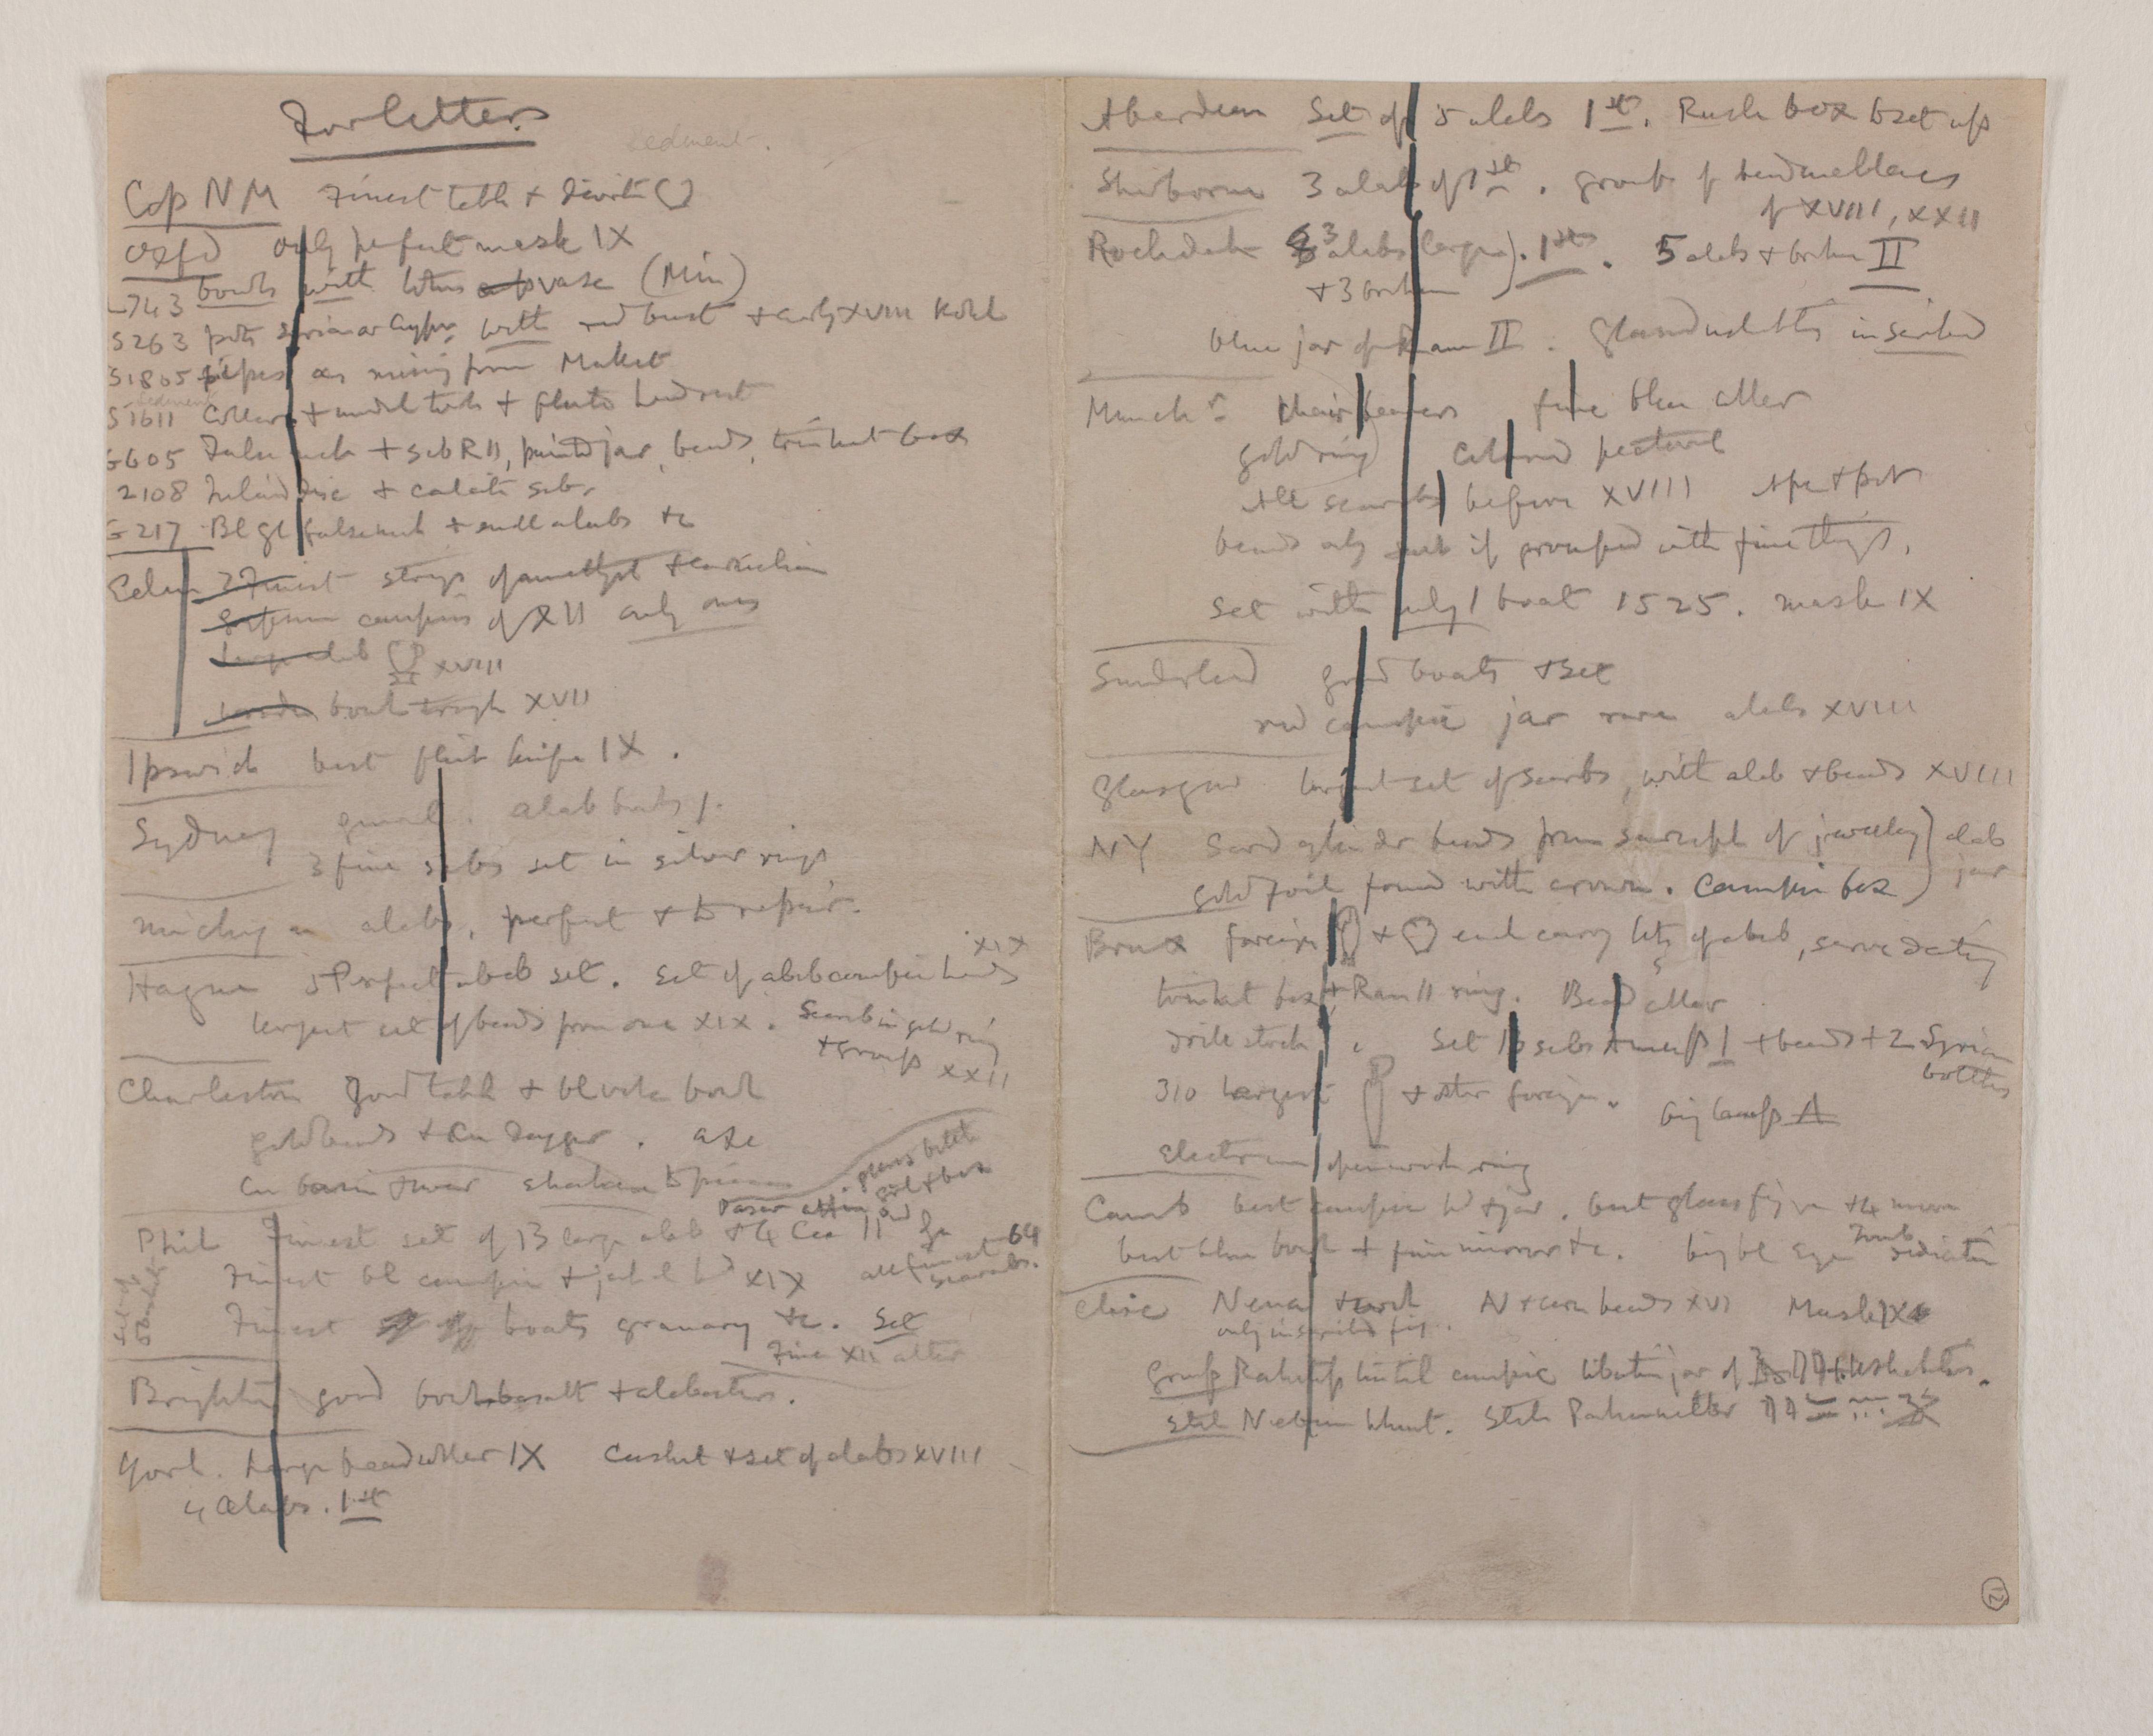 1919-21 Sedment, Lahun Multiple institution list PMA/WFP1/D/24/12.4